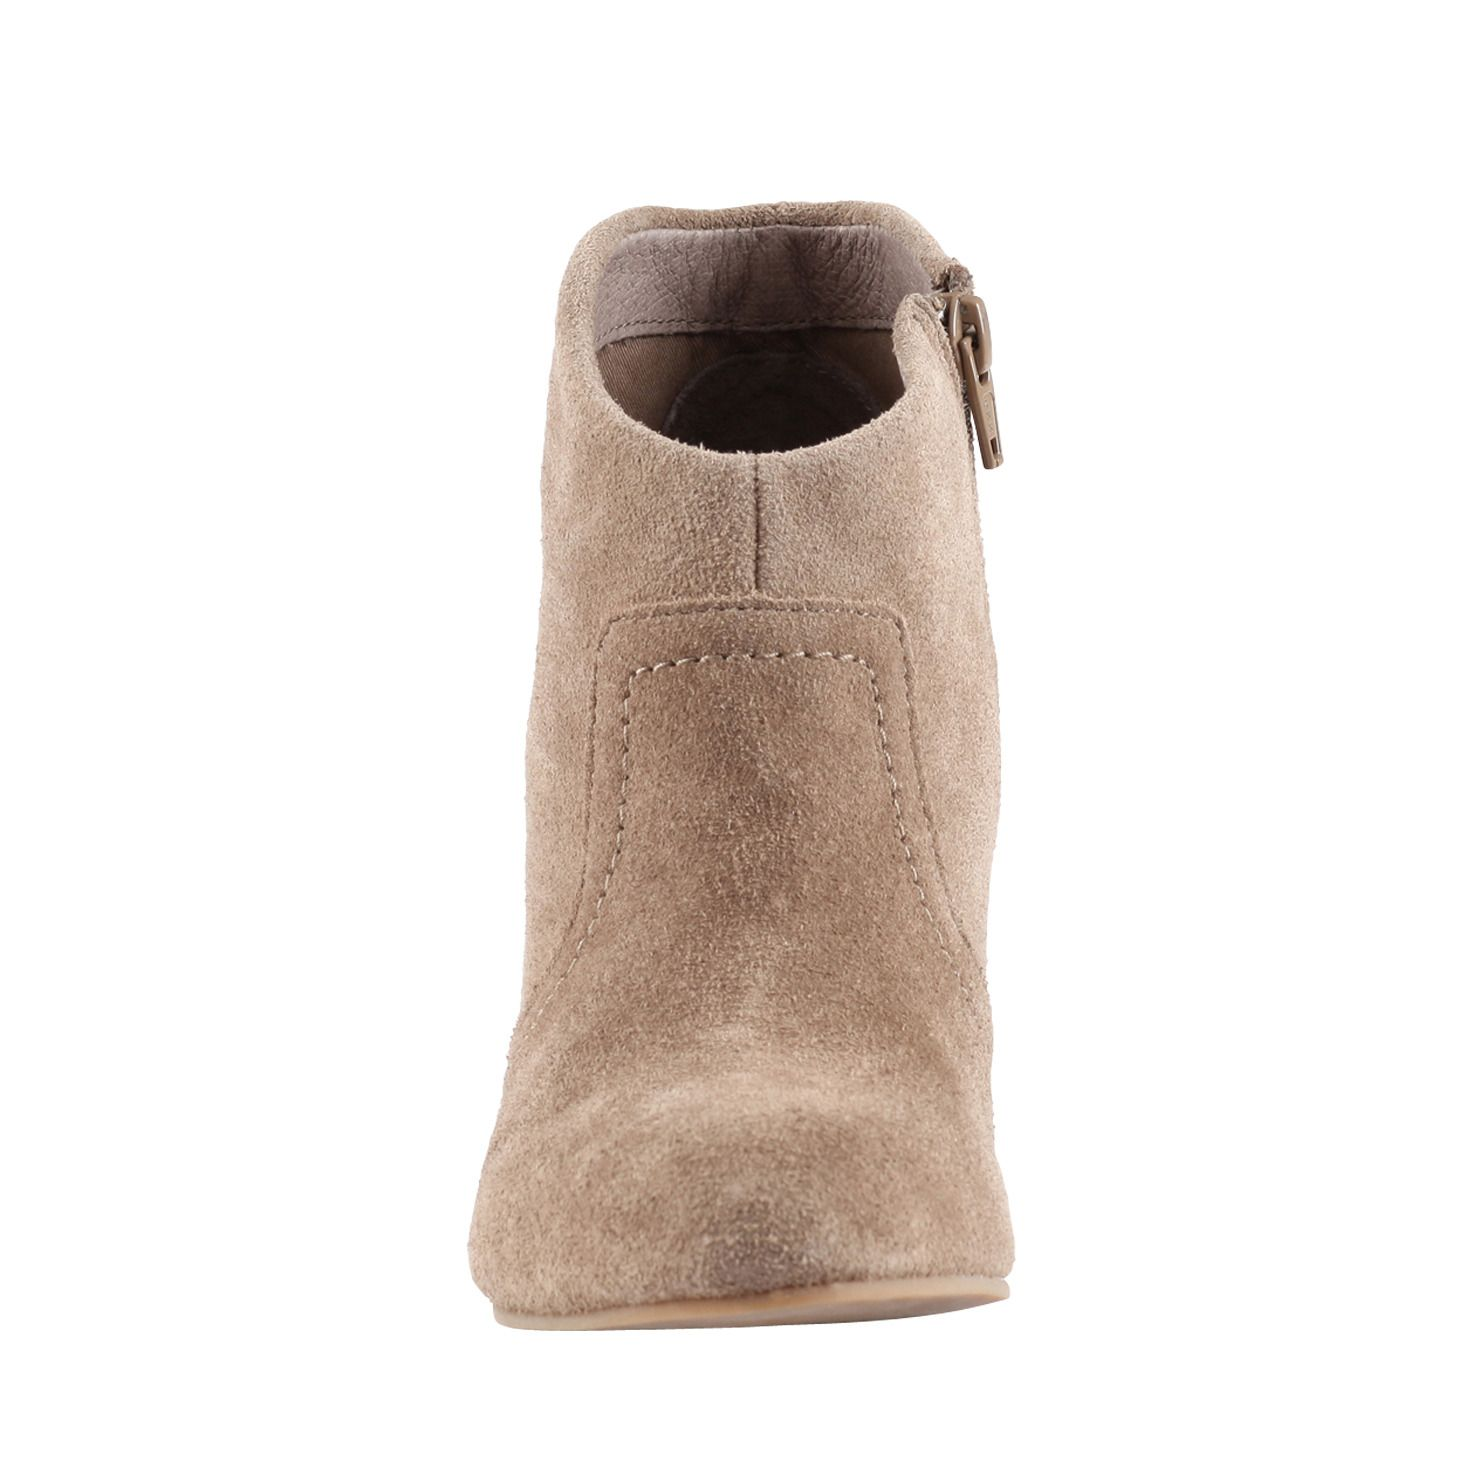 JOSSELINE - women's ankle boots boots for sale at ALDO Shoes.